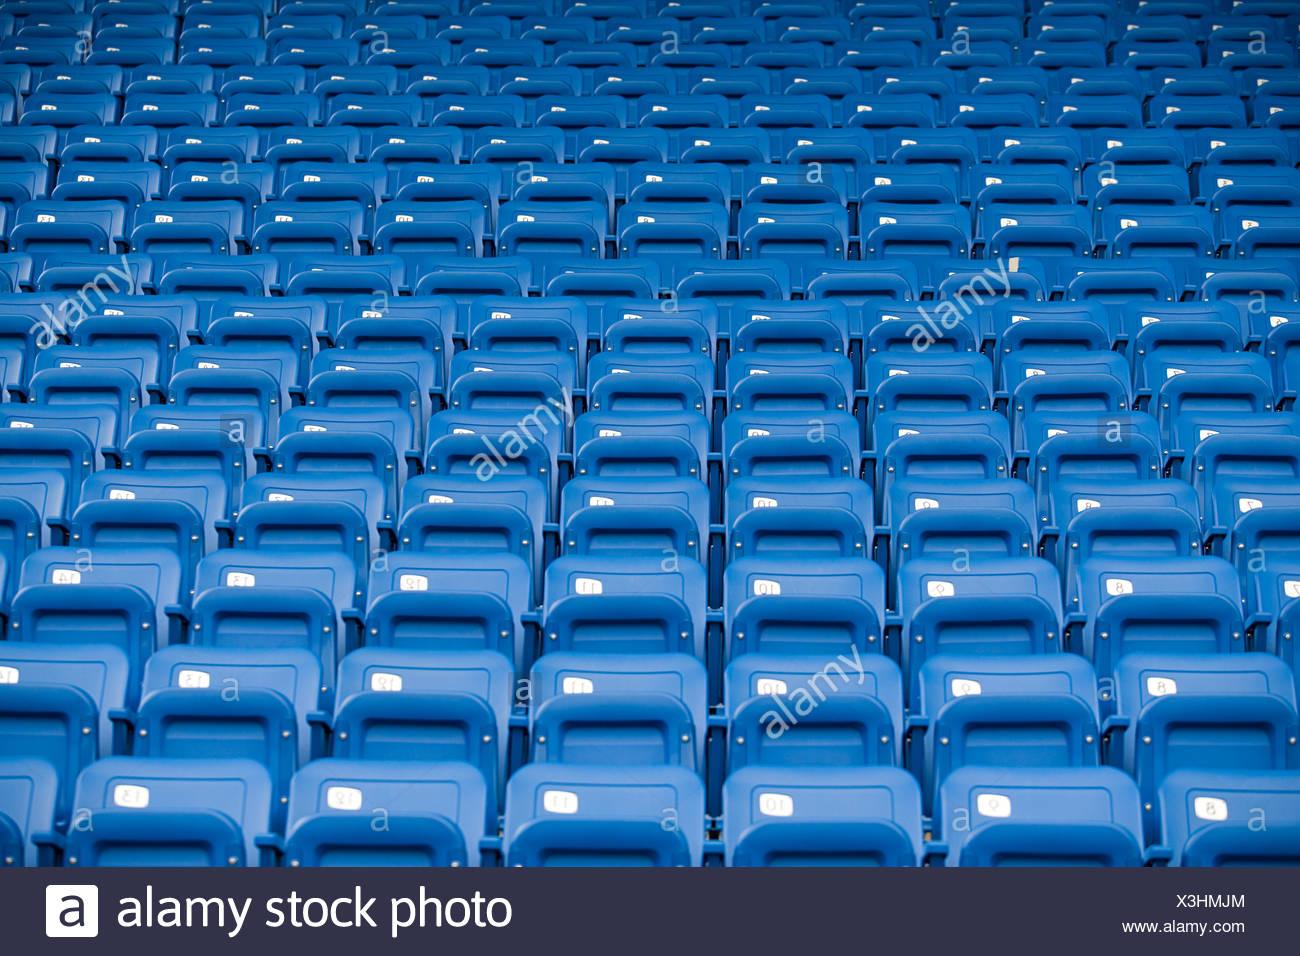 Stadium seats - Stock Image